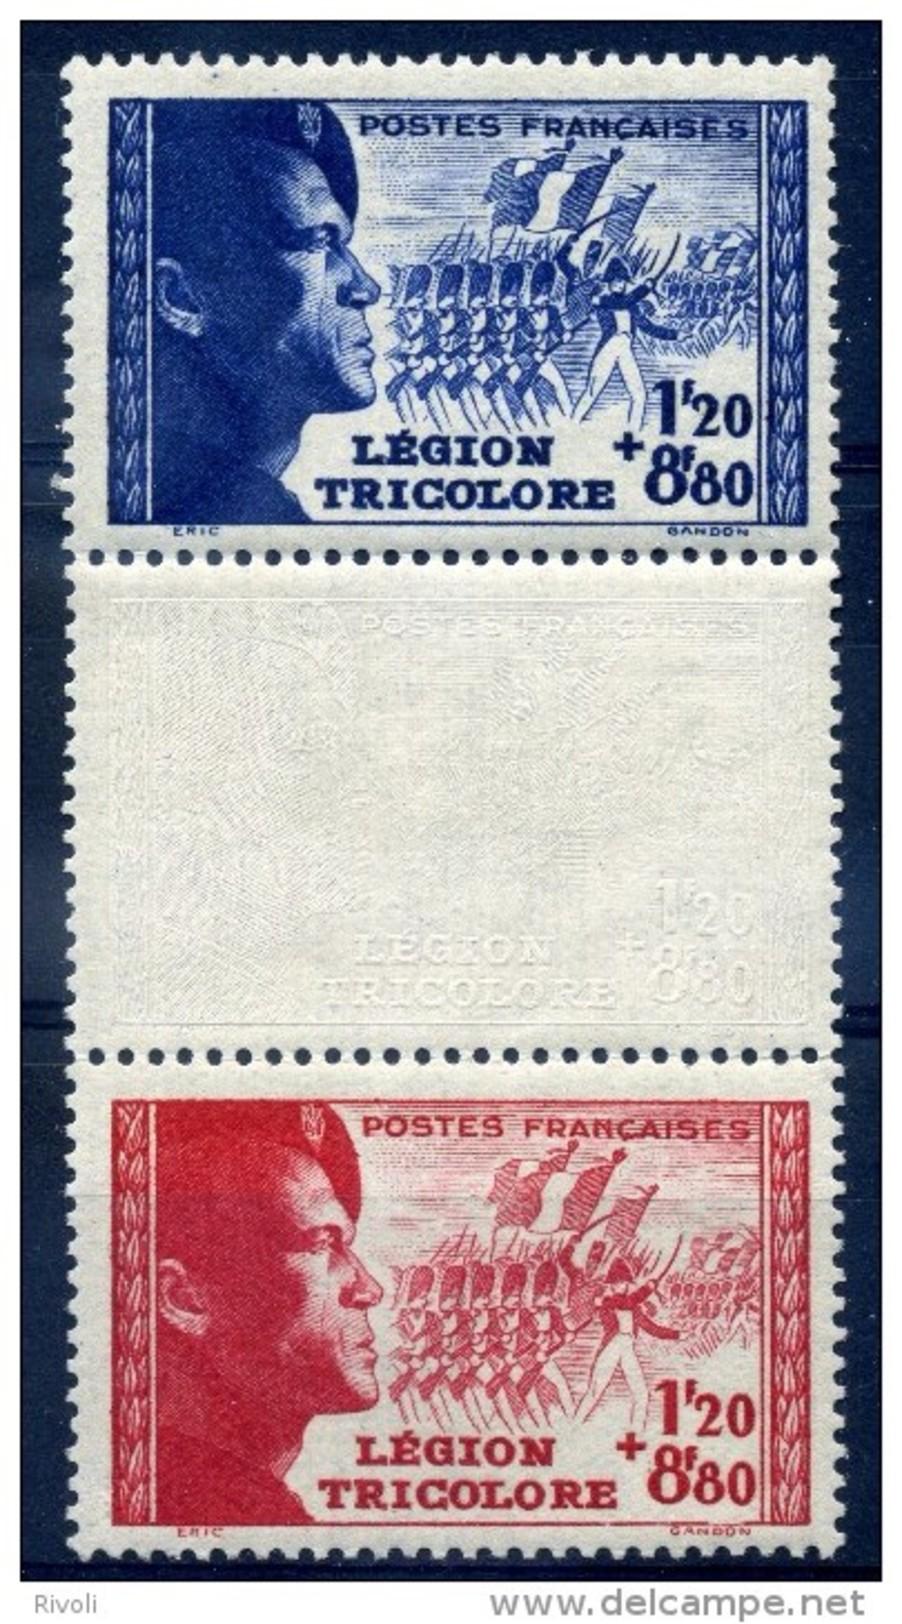 FRANCE 1942  YVERT  N° 565 à 566 A Avec Bande Neuf LUXE  MNH COTE 27.5E - Nuovi